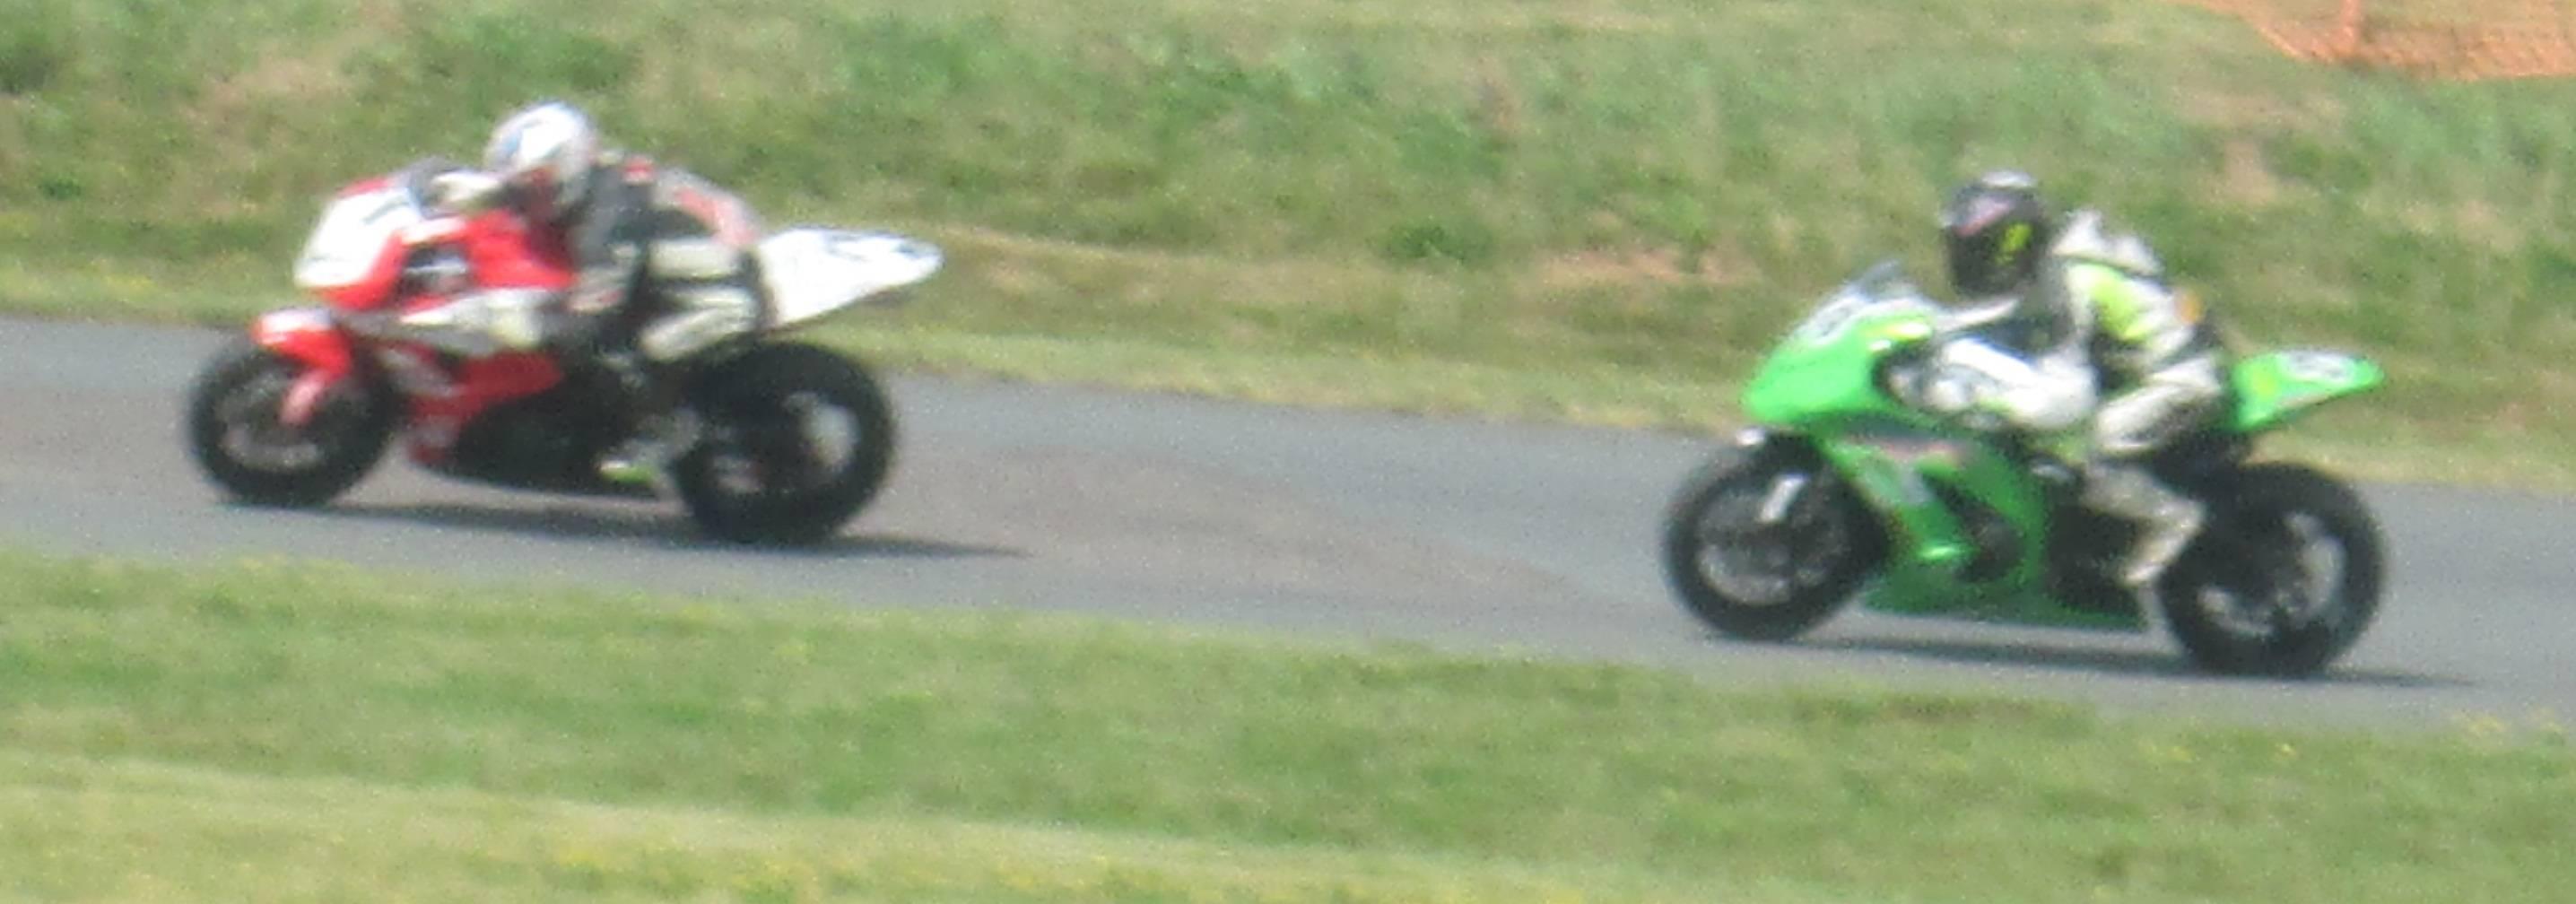 Superbikes 2014 picture number 61